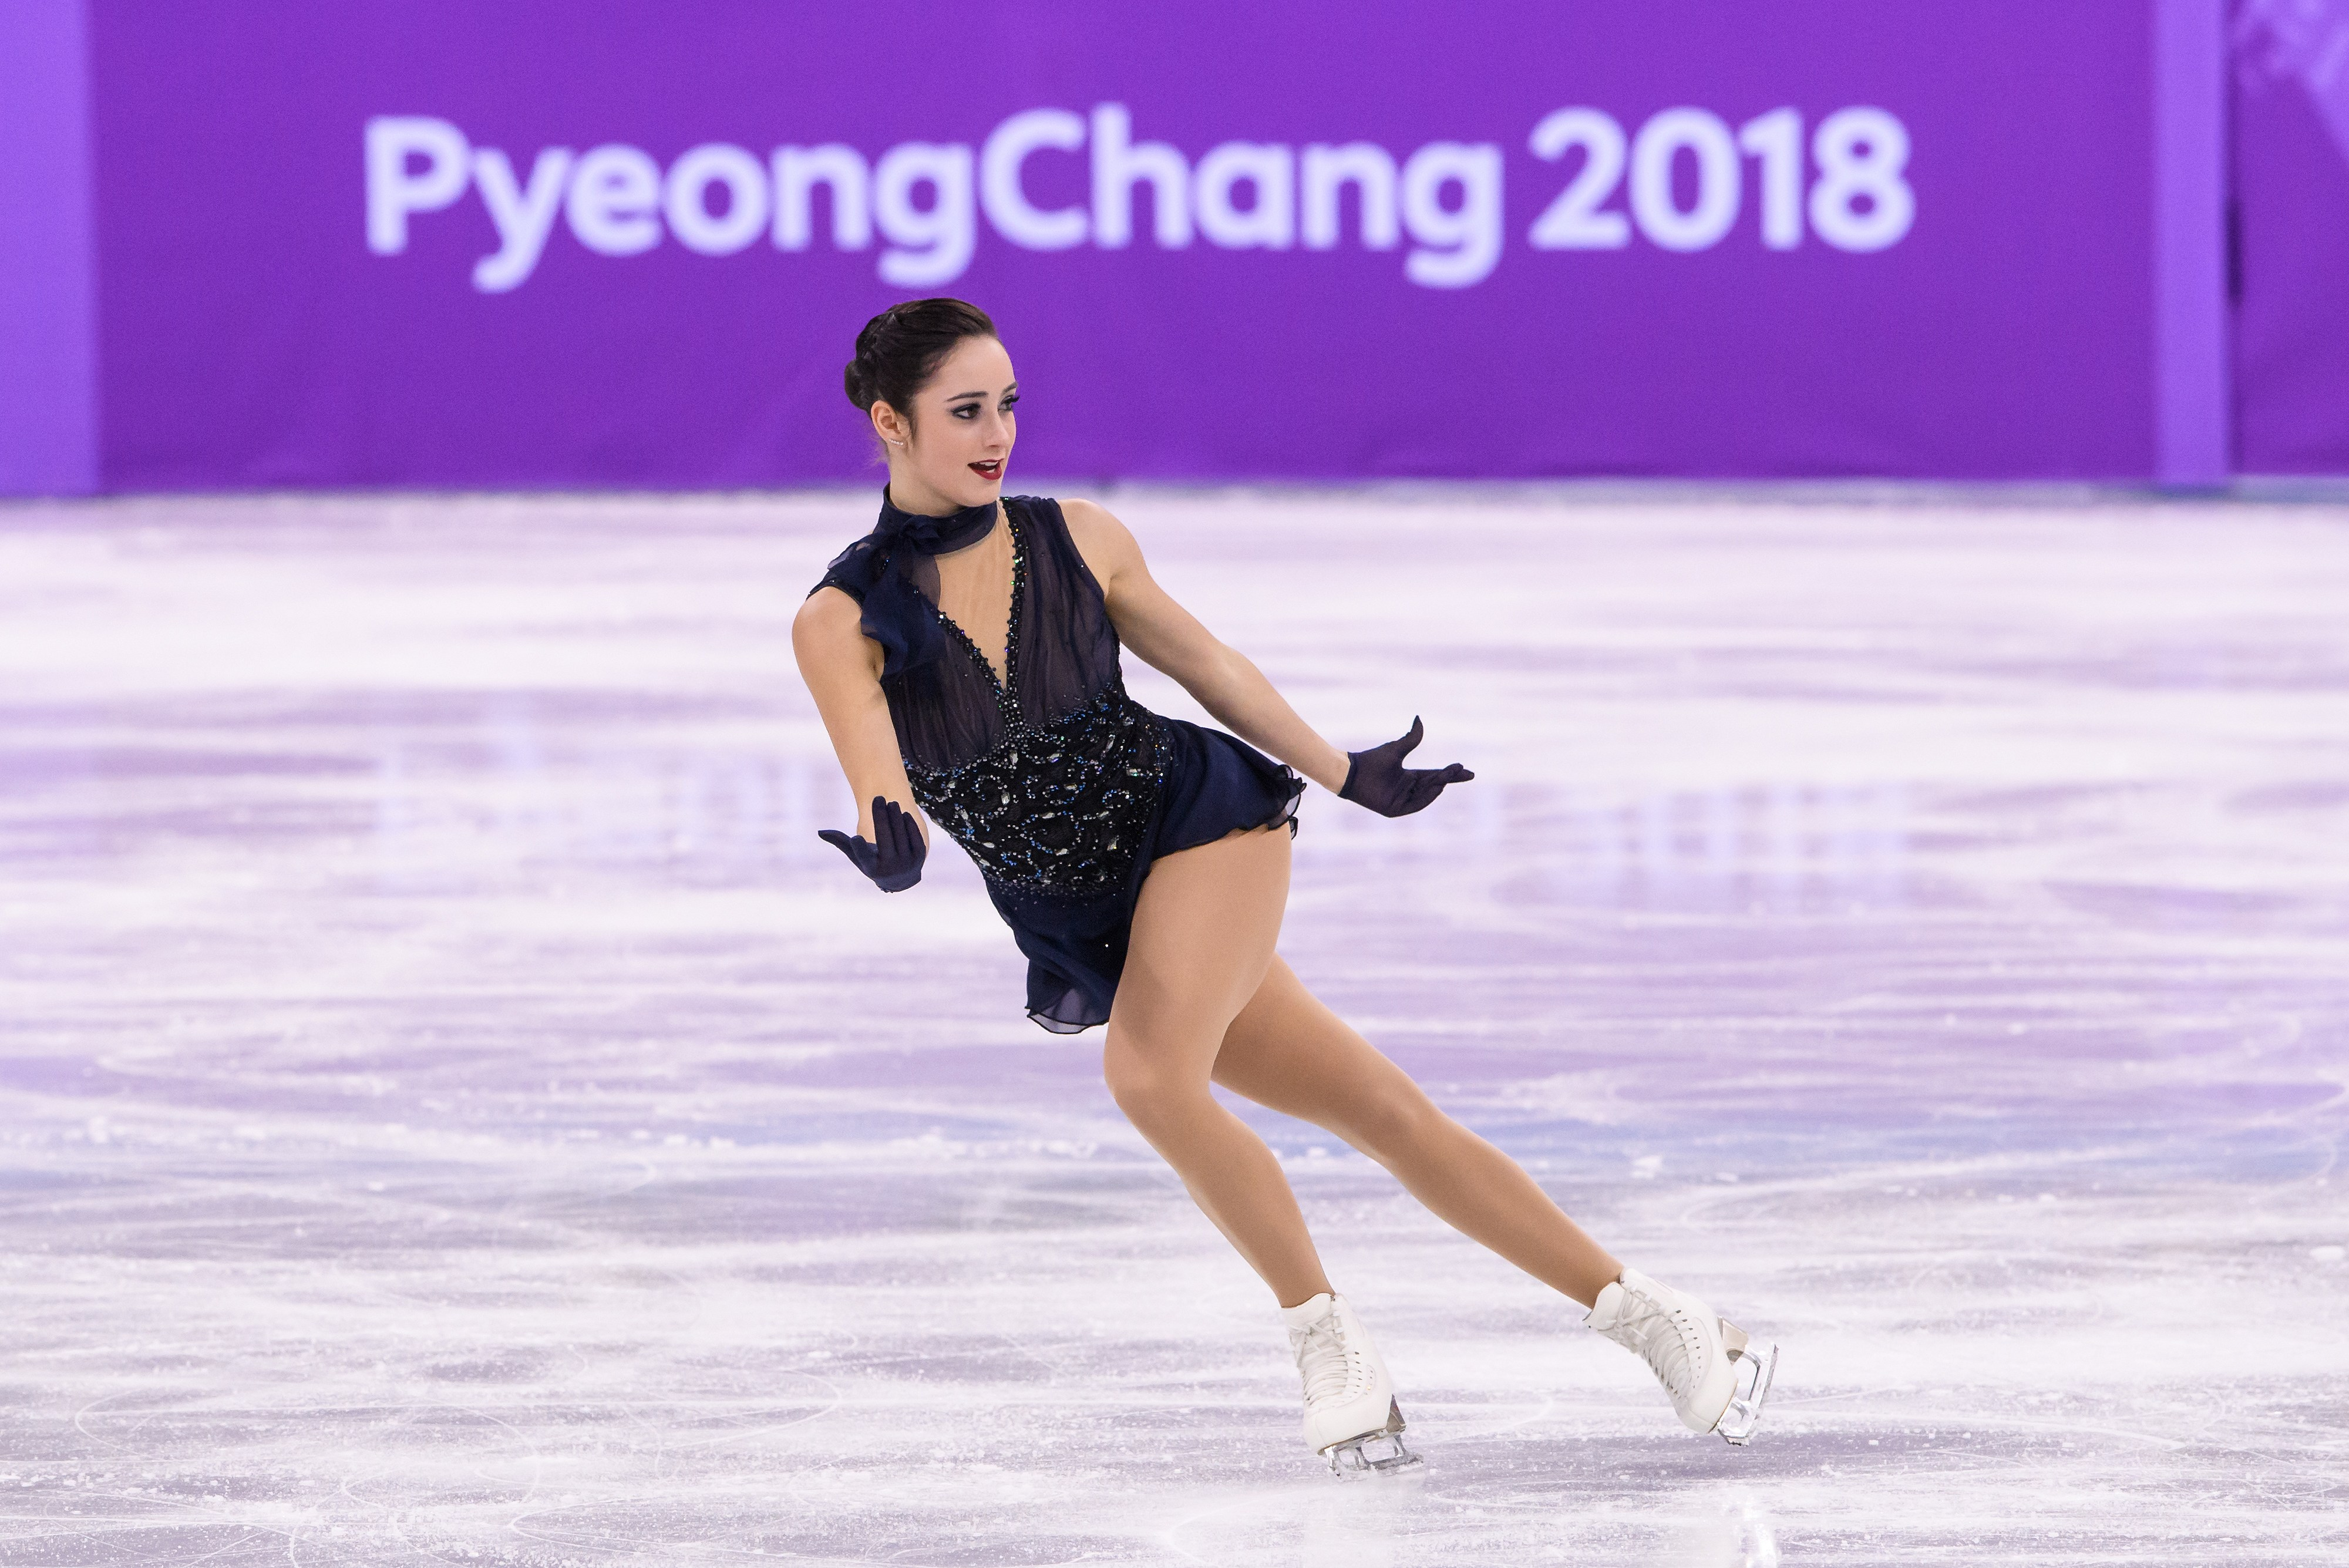 Team Canada Kaetlyn Osmond PyeongChang 2018 team event